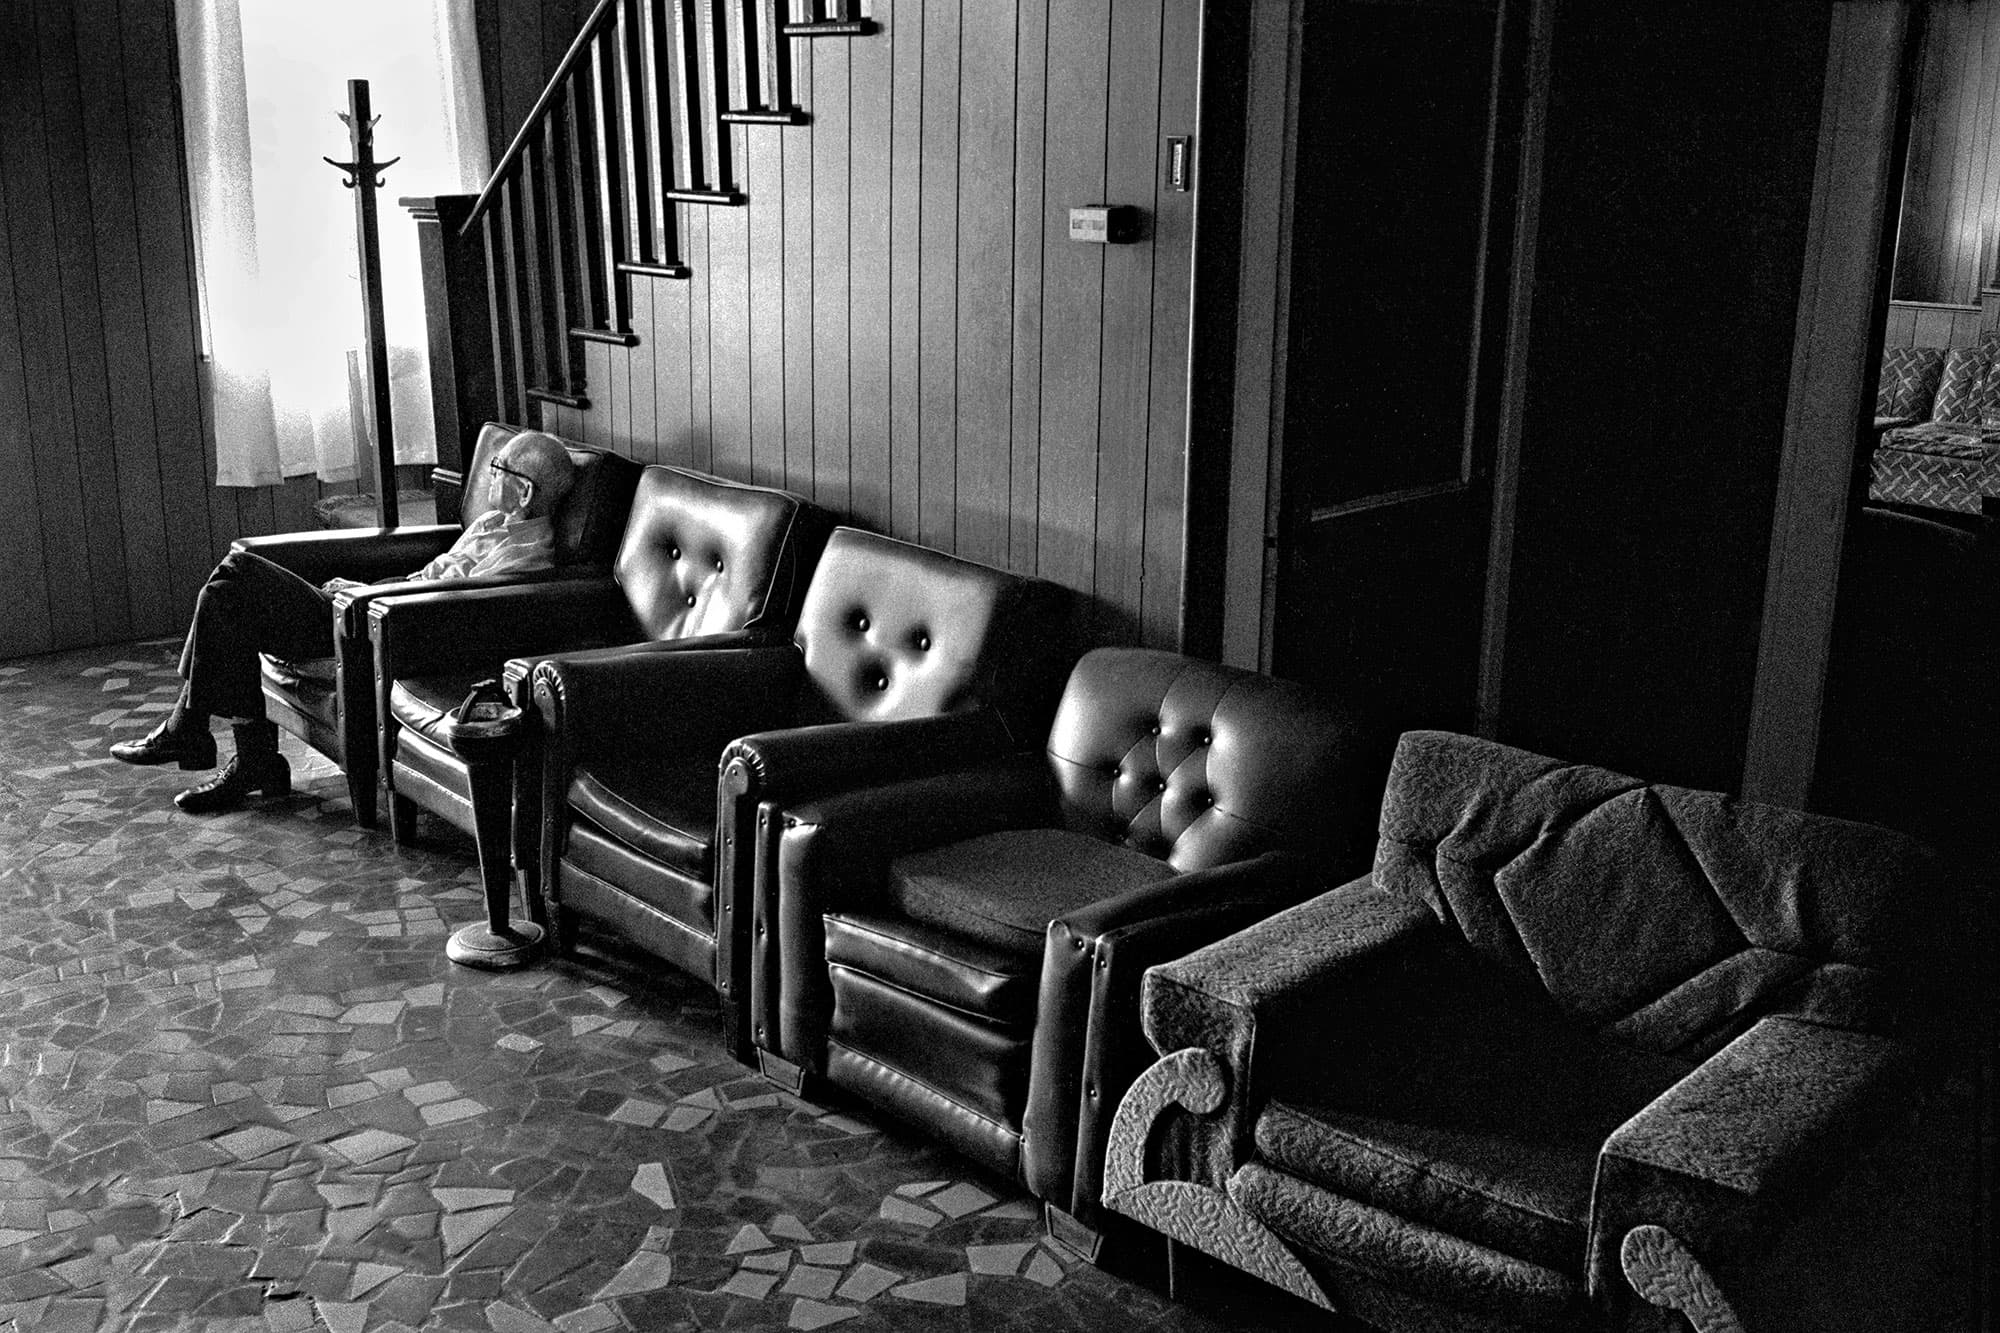 West-Virginia-Hotel-1978-arthur-lazar